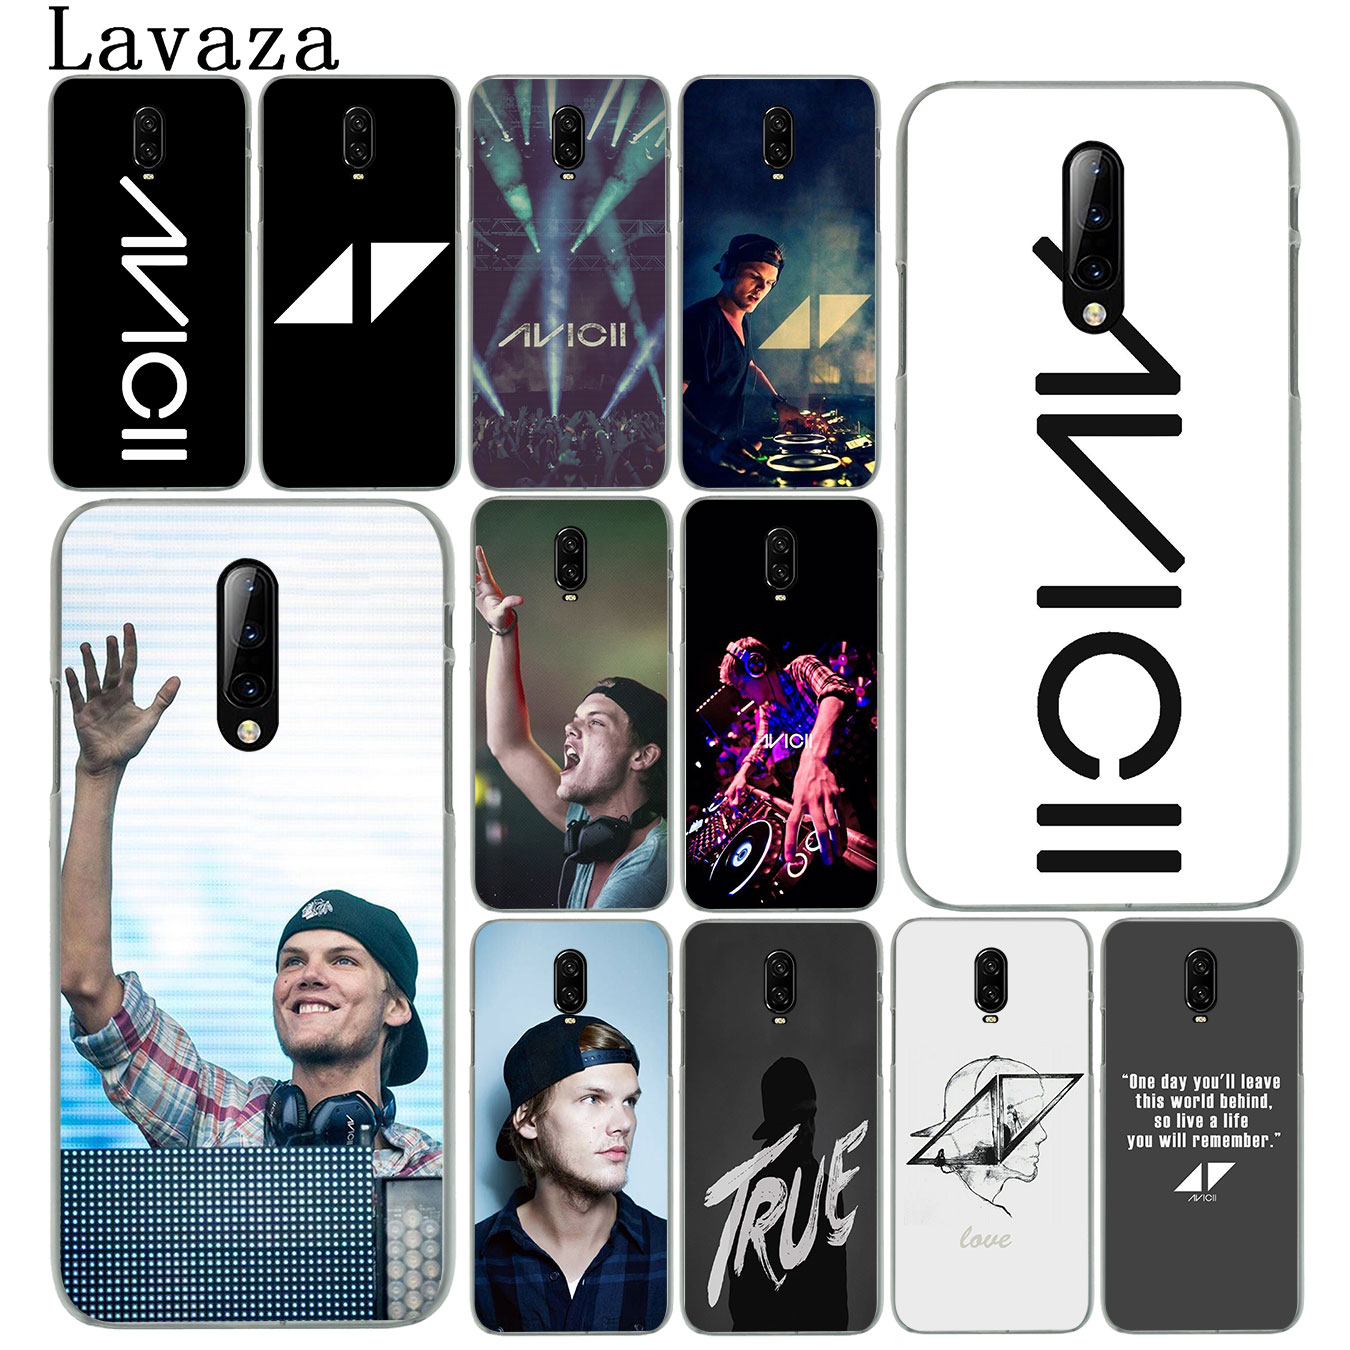 DJ avicii funda de teléfono móvil de plástico duro excelente para Oneplus 7 7T Pro 6 6t 5 5T funda One Plus 7Pro